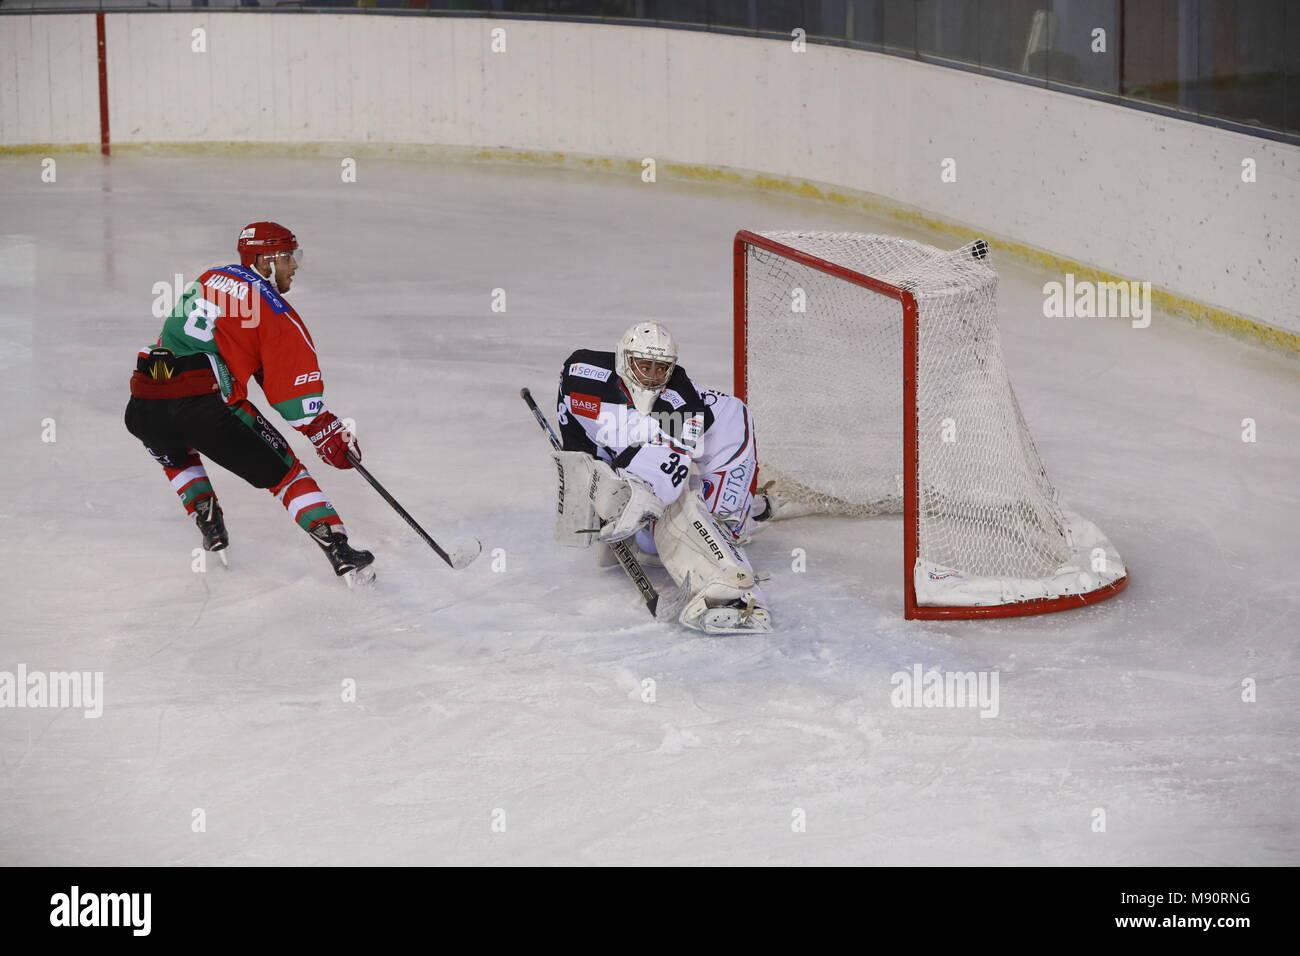 Ice Hockey match.  Hockey team. Goal. - Stock Image